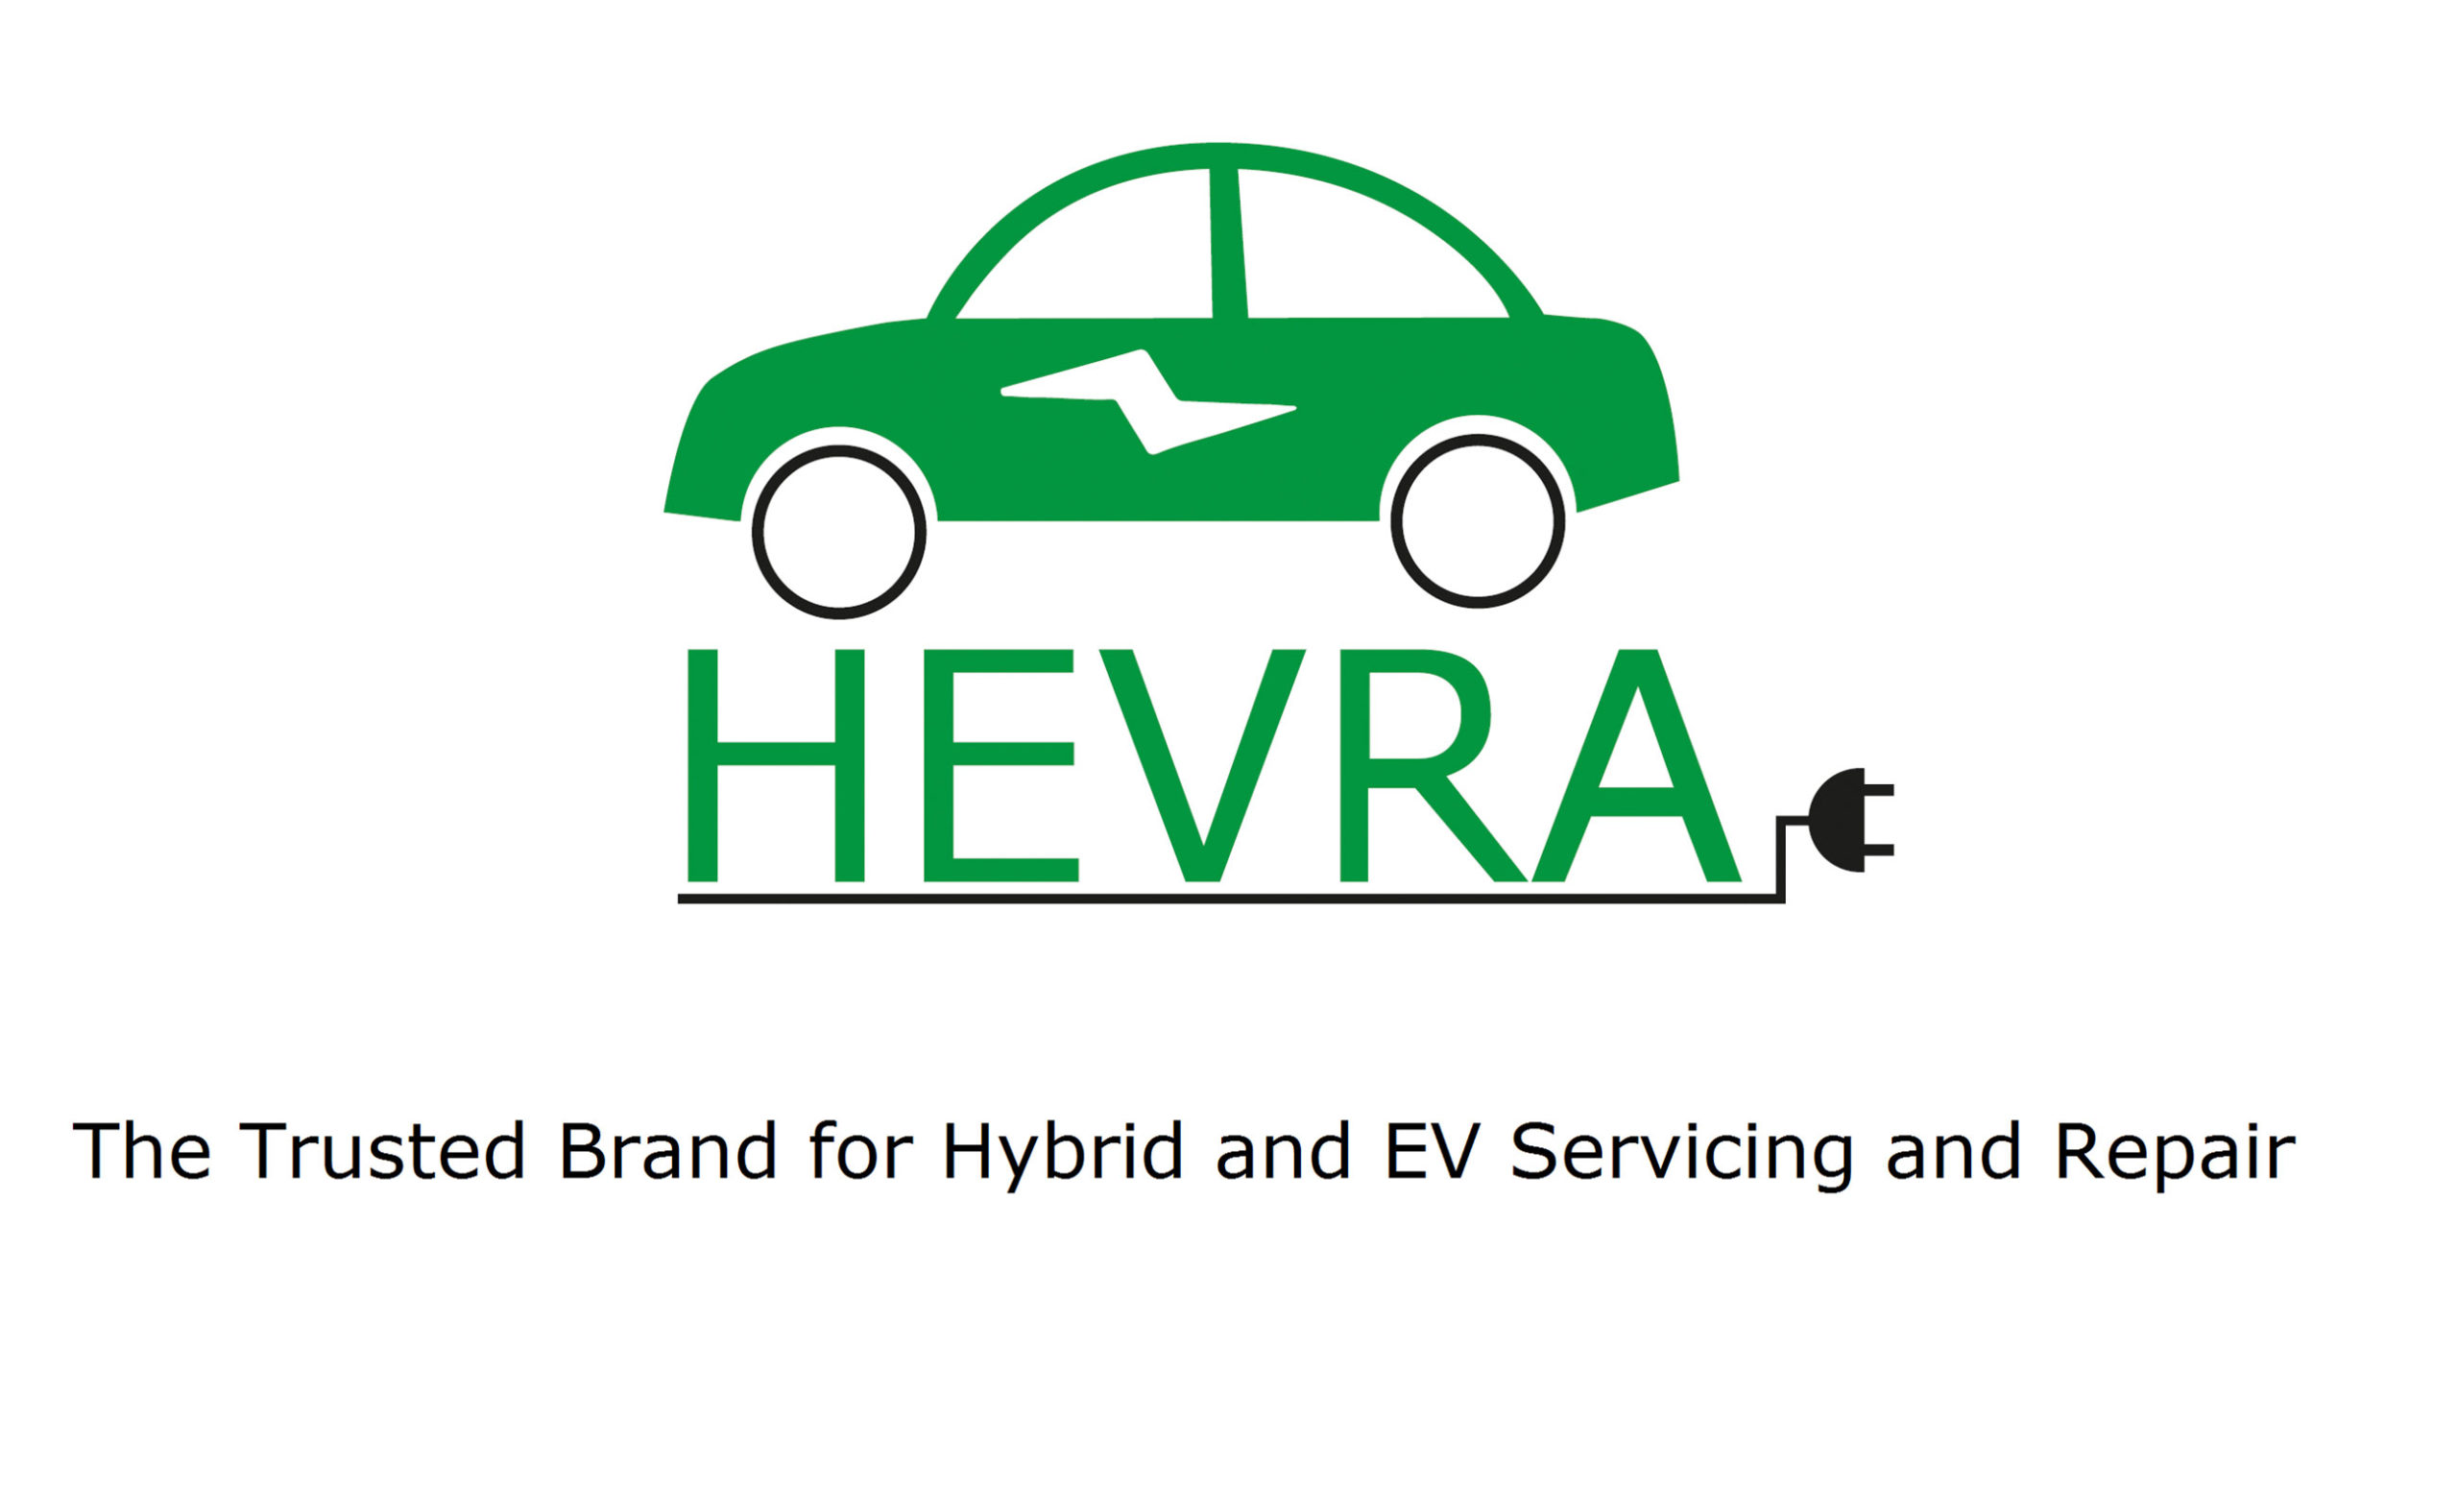 Hevra